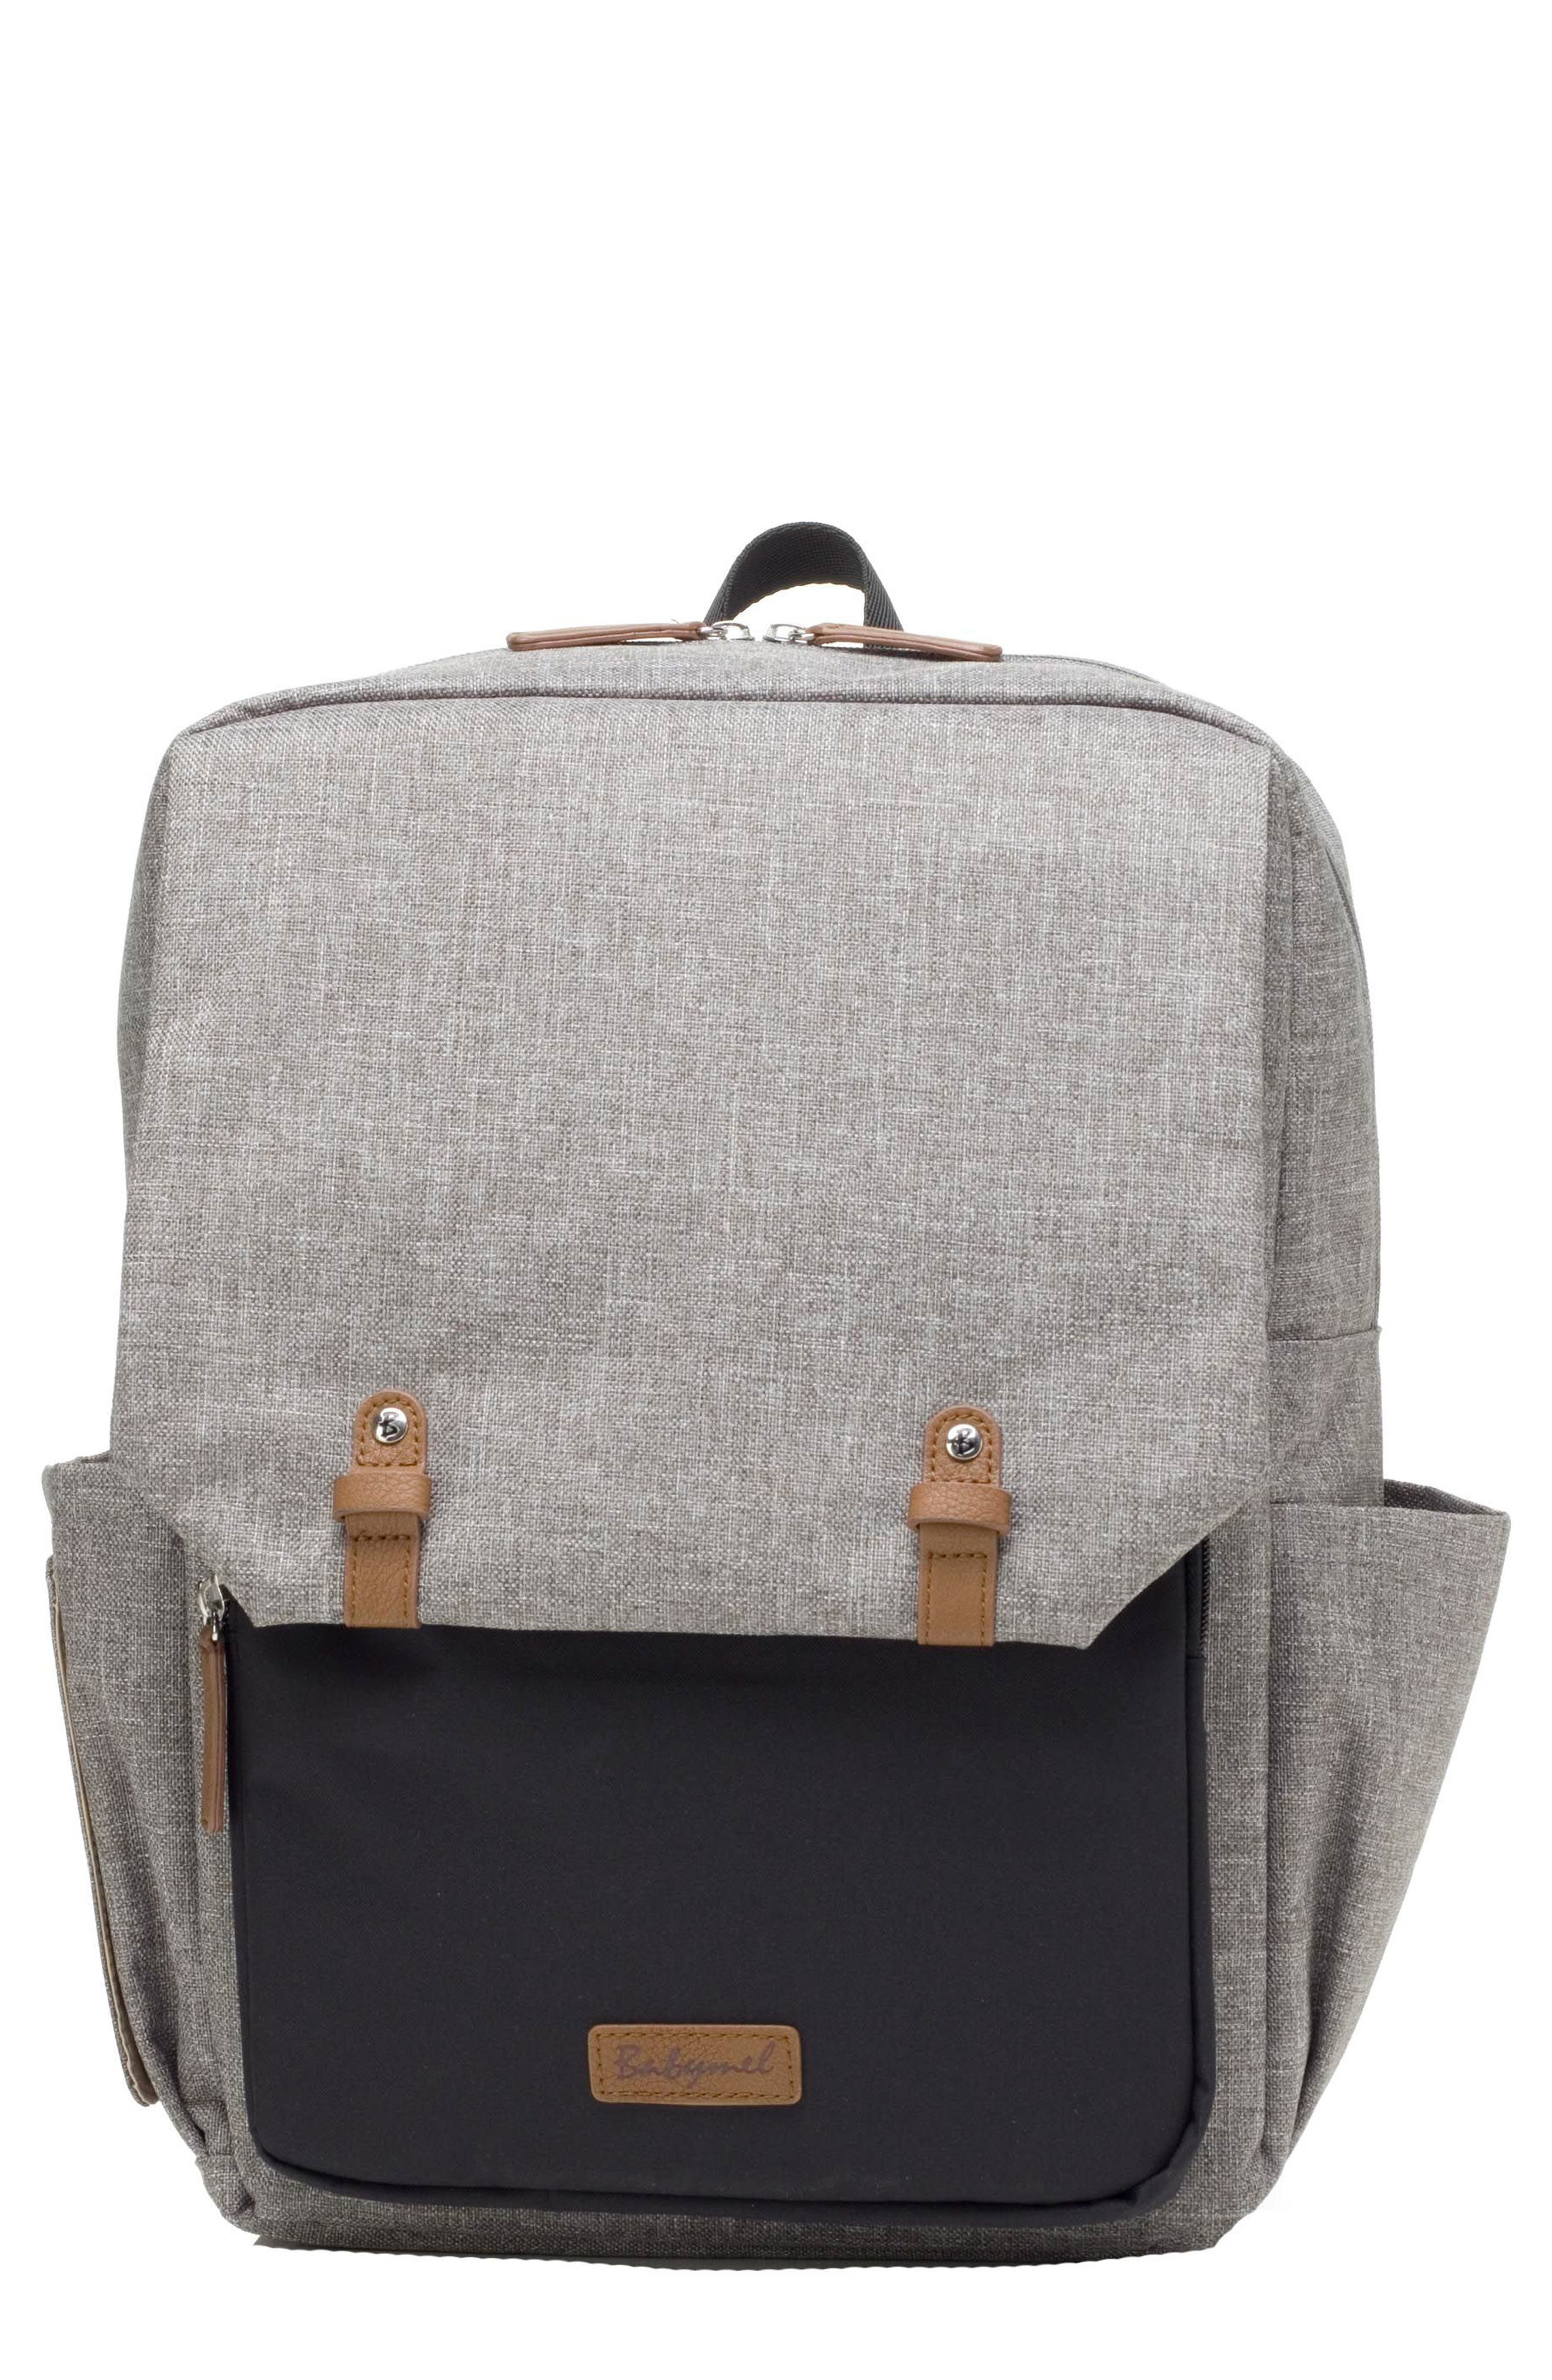 George Water Resistant Diaper Backpack,                         Main,                         color, BLACK/ GREY